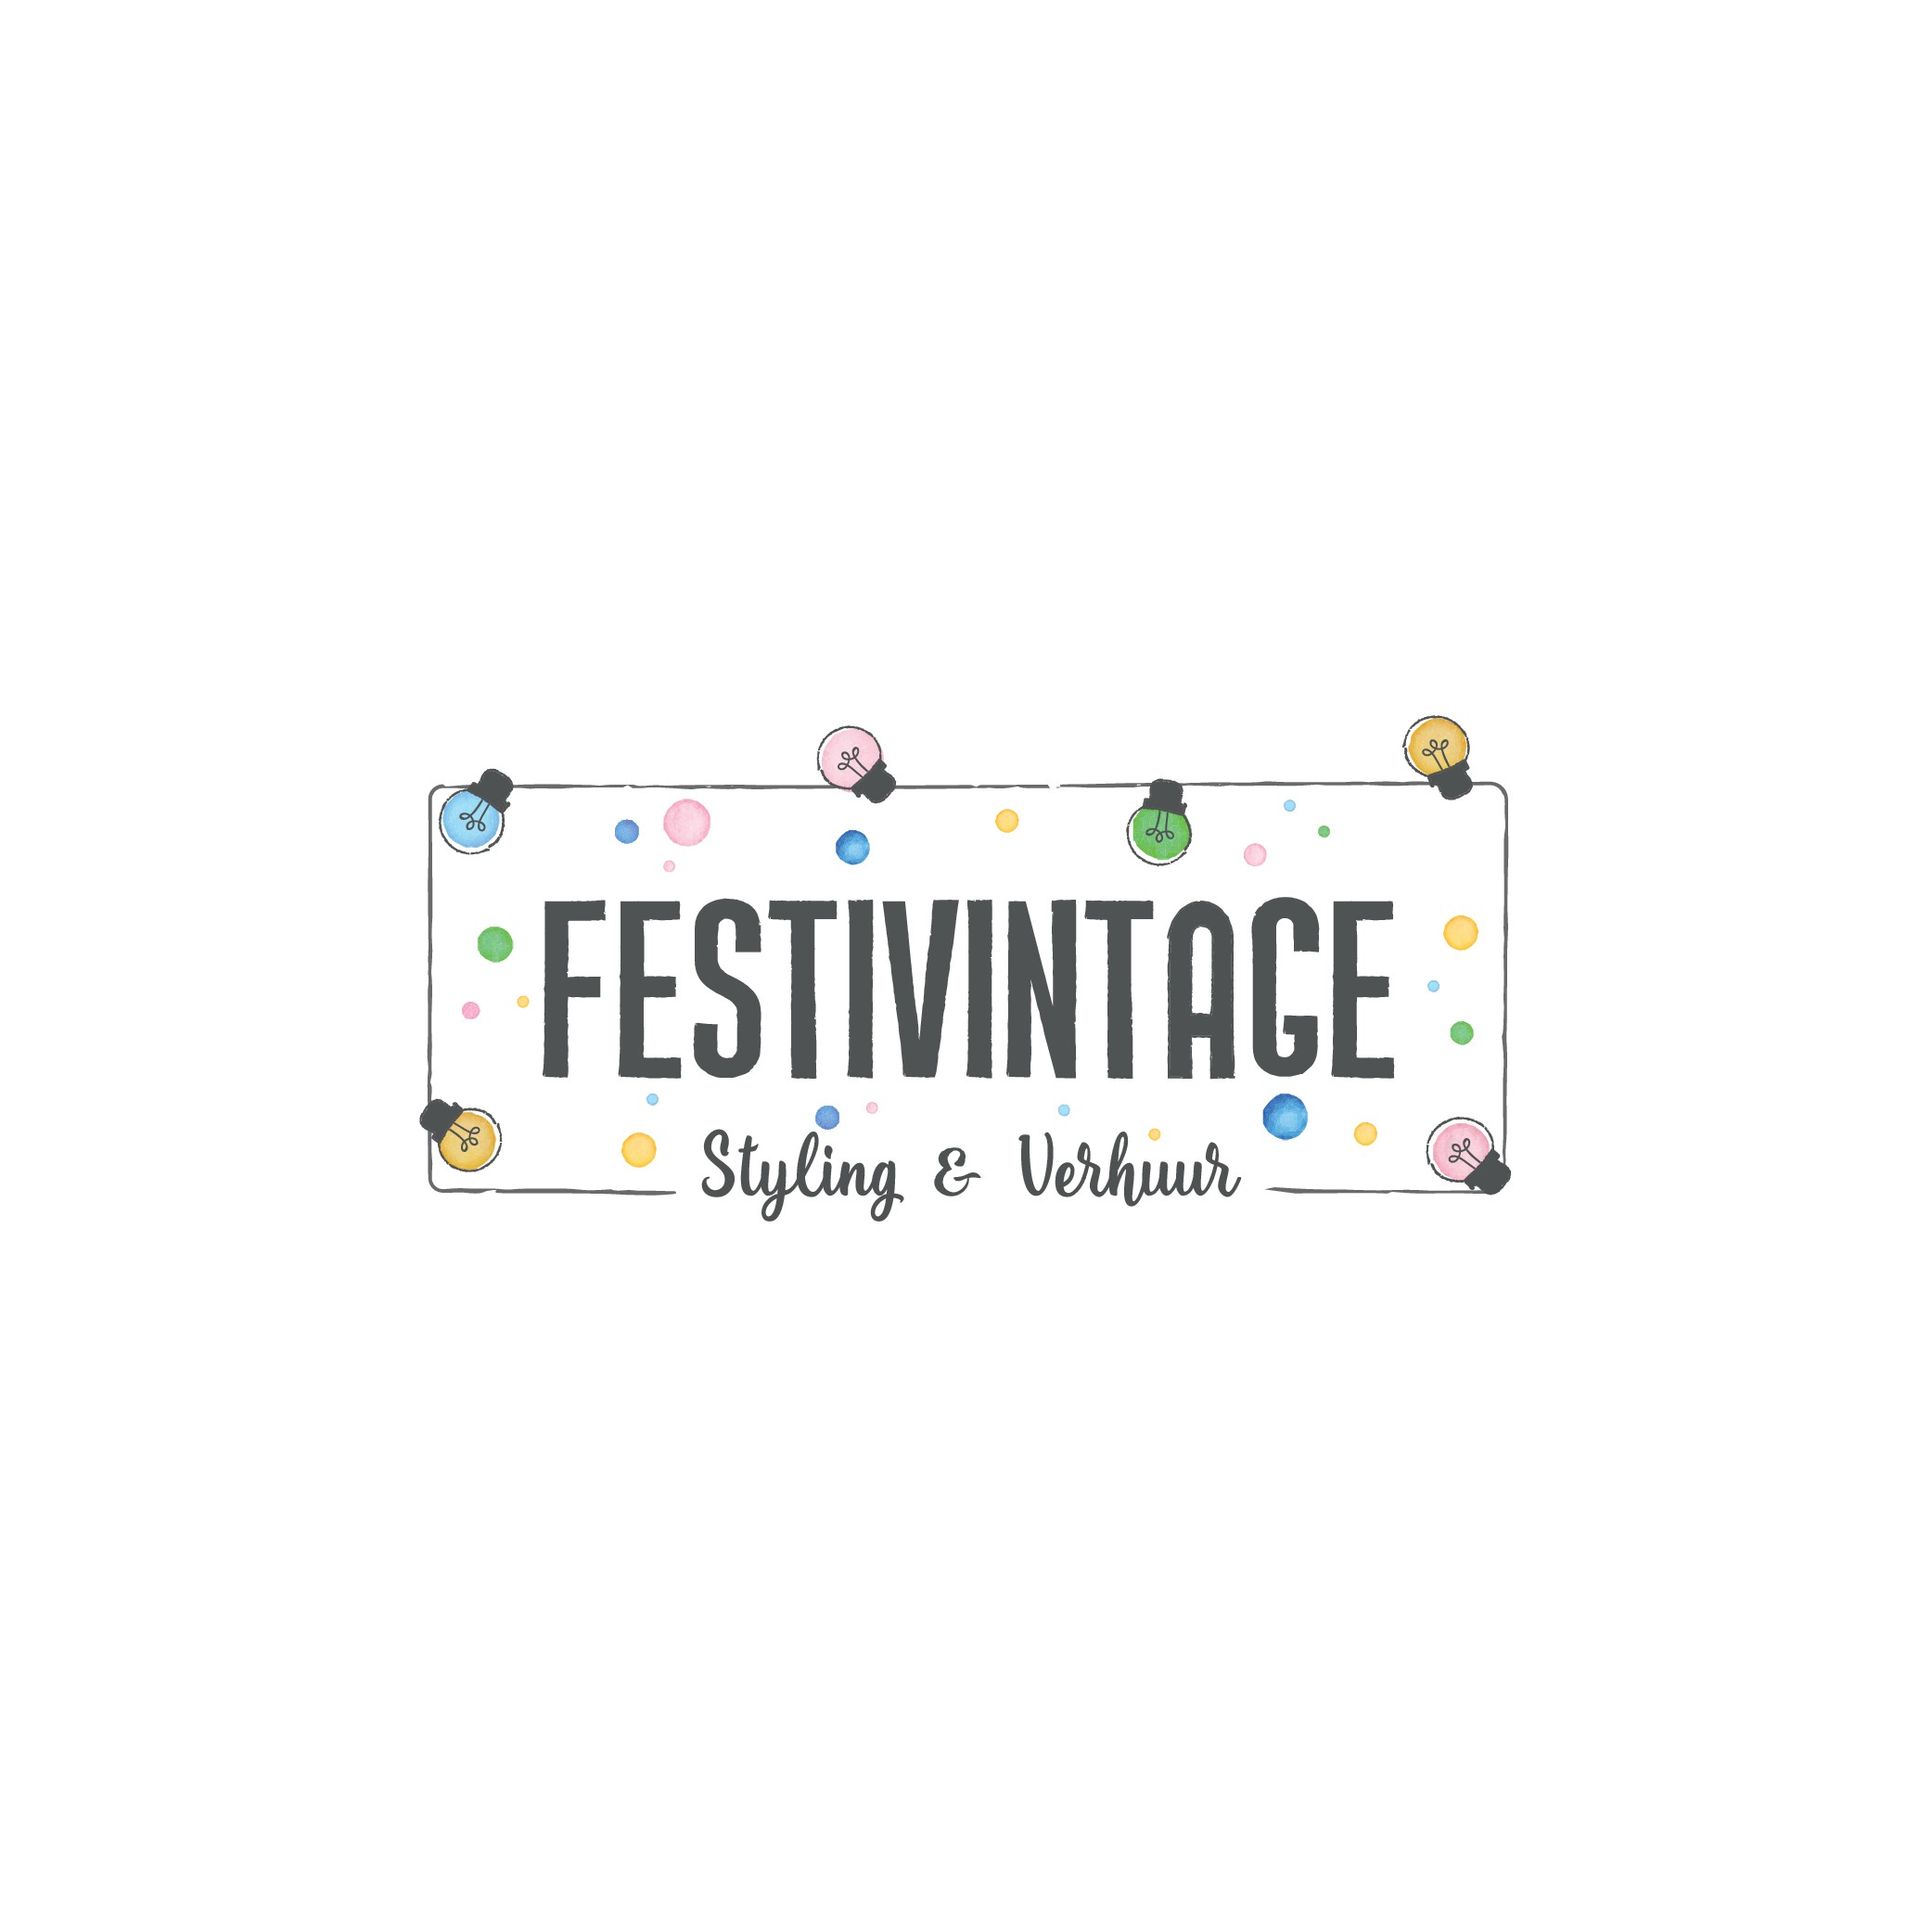 Logo for a vintage rental company - Festivintage